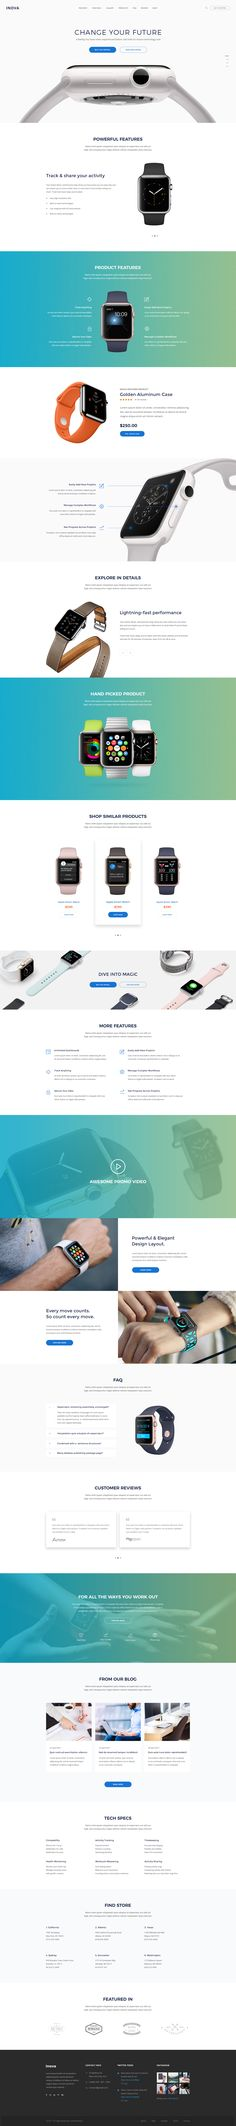 Inova - Product, SaaS, App, Startup, Marketing Landing Page #app #app landing #clean • Download ➝ https://themeforest.net/item/inova-product-saas-app-startup-marketing-landing-page/19486443?ref=pxcr